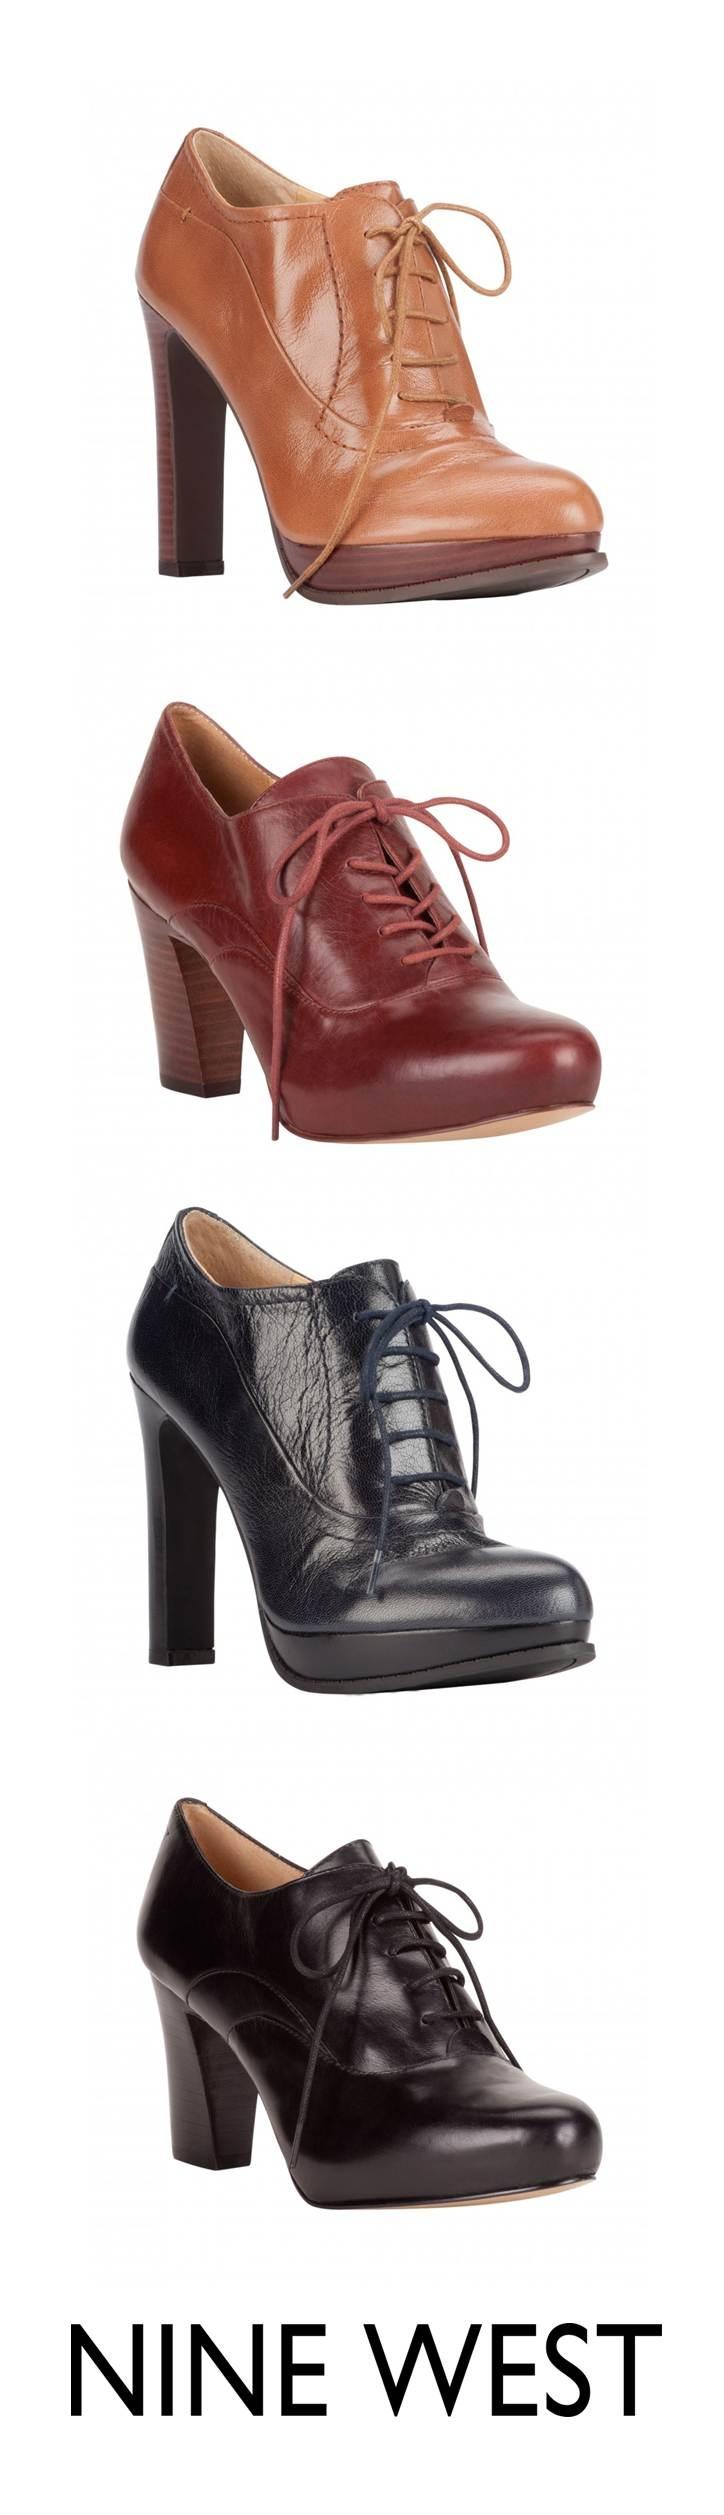 Botines con agujeta - Botas y botines - Zapatos Nine West México